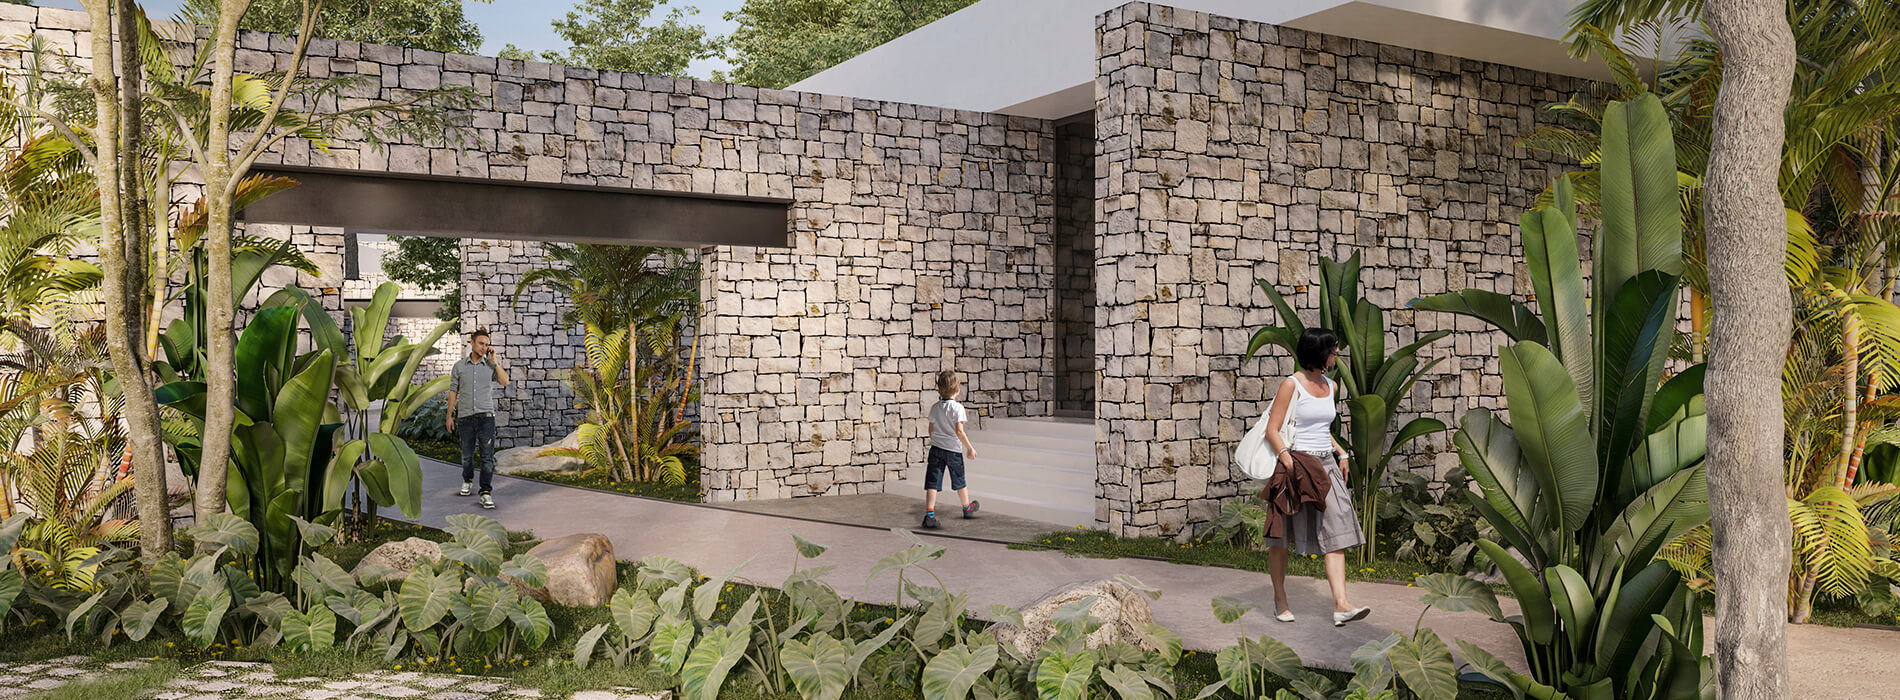 Casas Venta Mérida Gretta Villas Goodlers